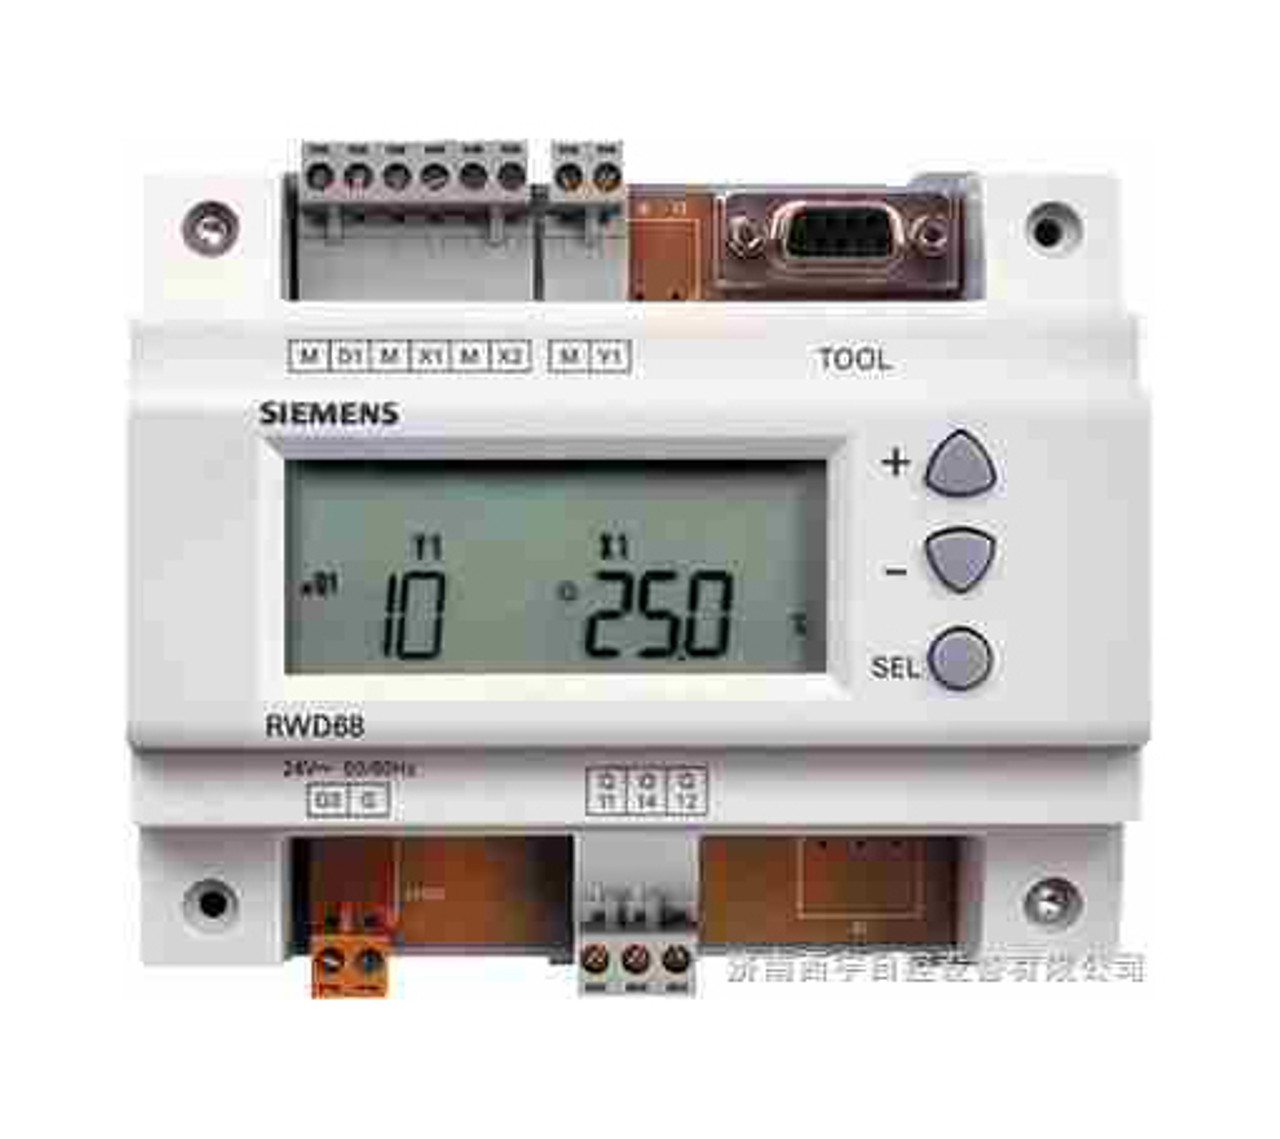 Siemens RWD68 Universal controller